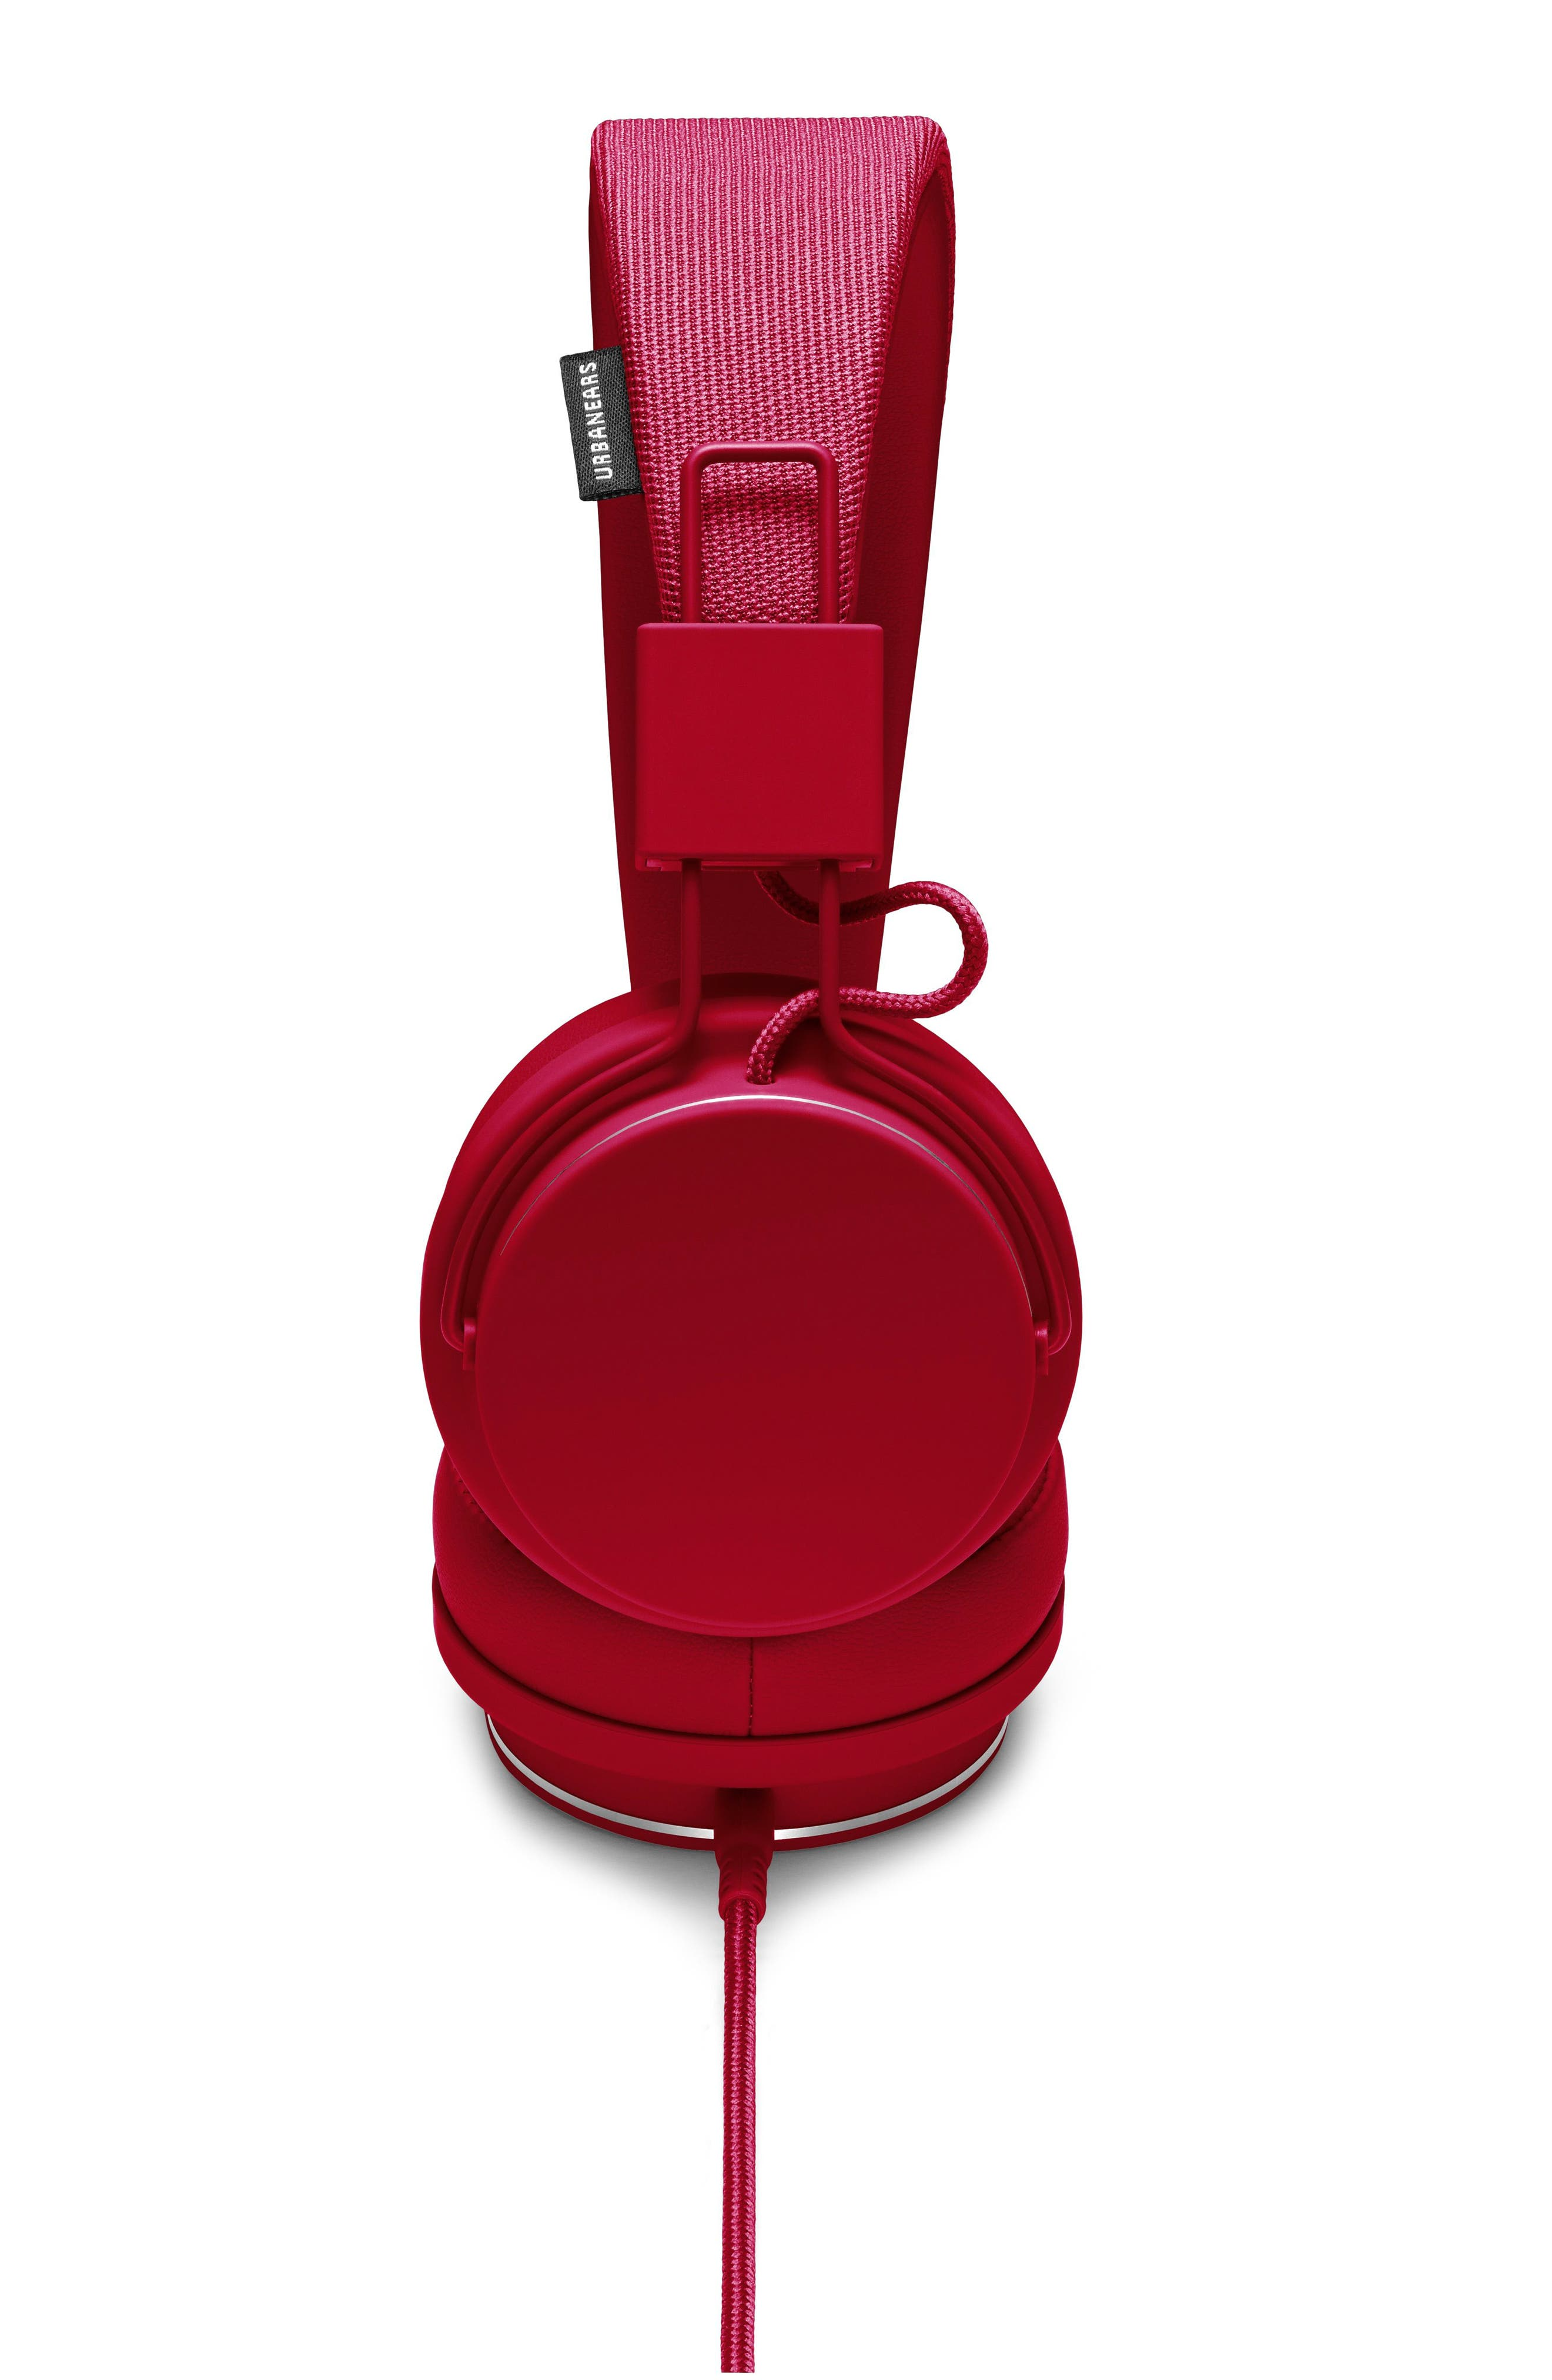 Plattan II On-Ear Headphones,                             Alternate thumbnail 4, color,                             Beryl Red